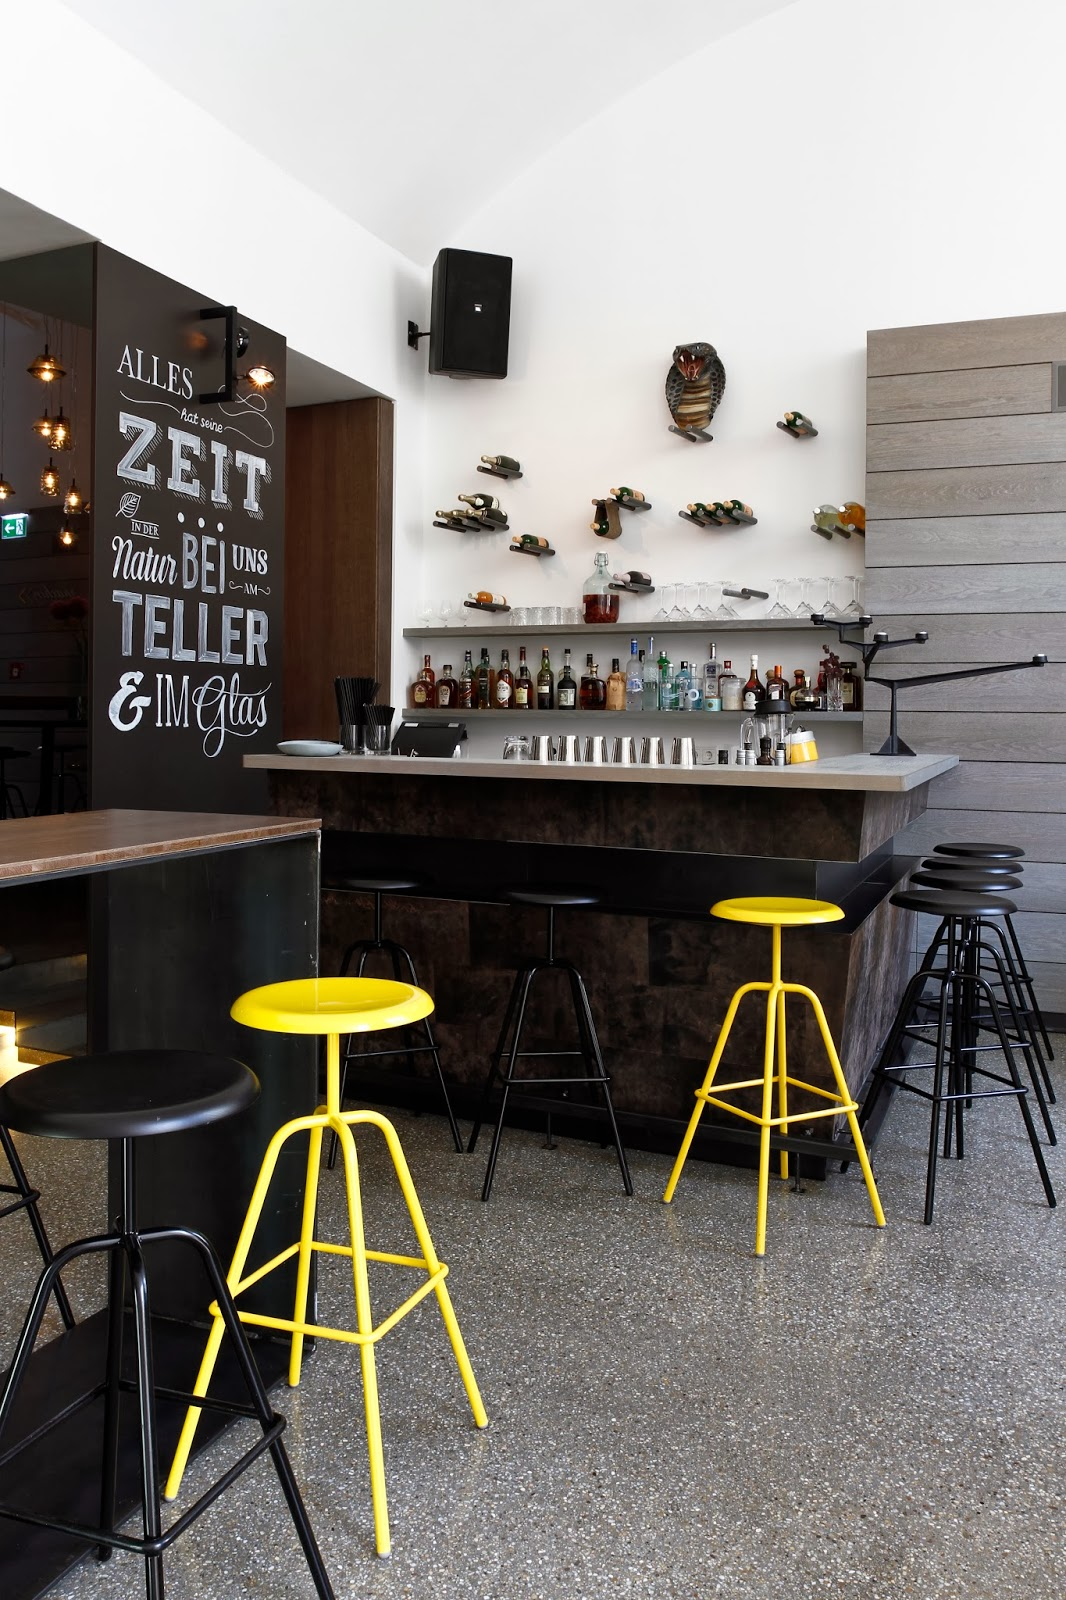 Rainer wallmann commercial interior design restaurant